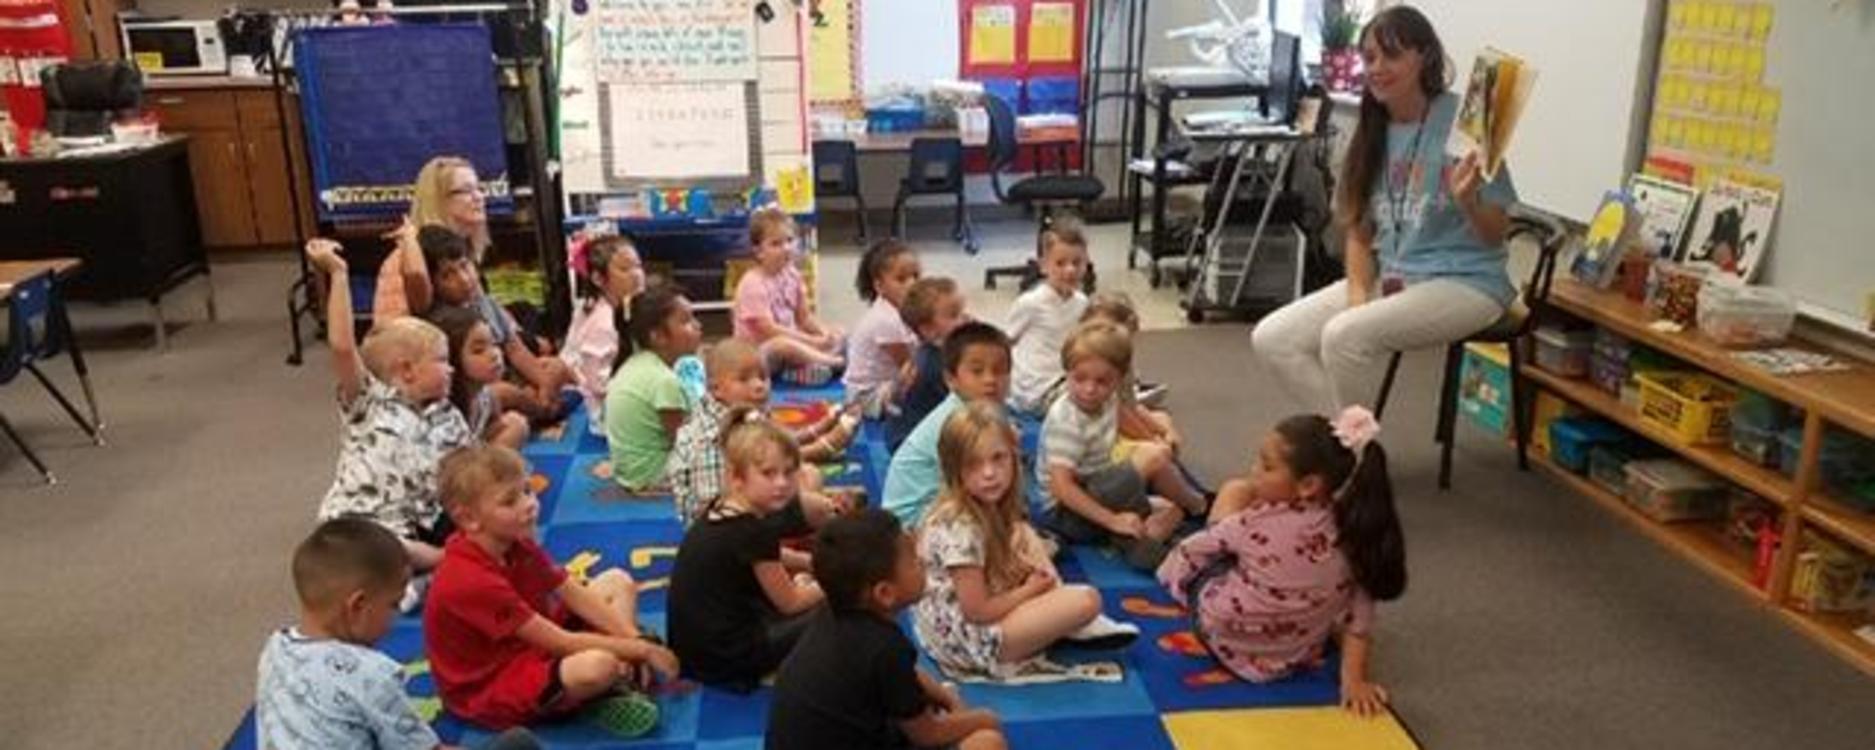 Clarksville Public Schools